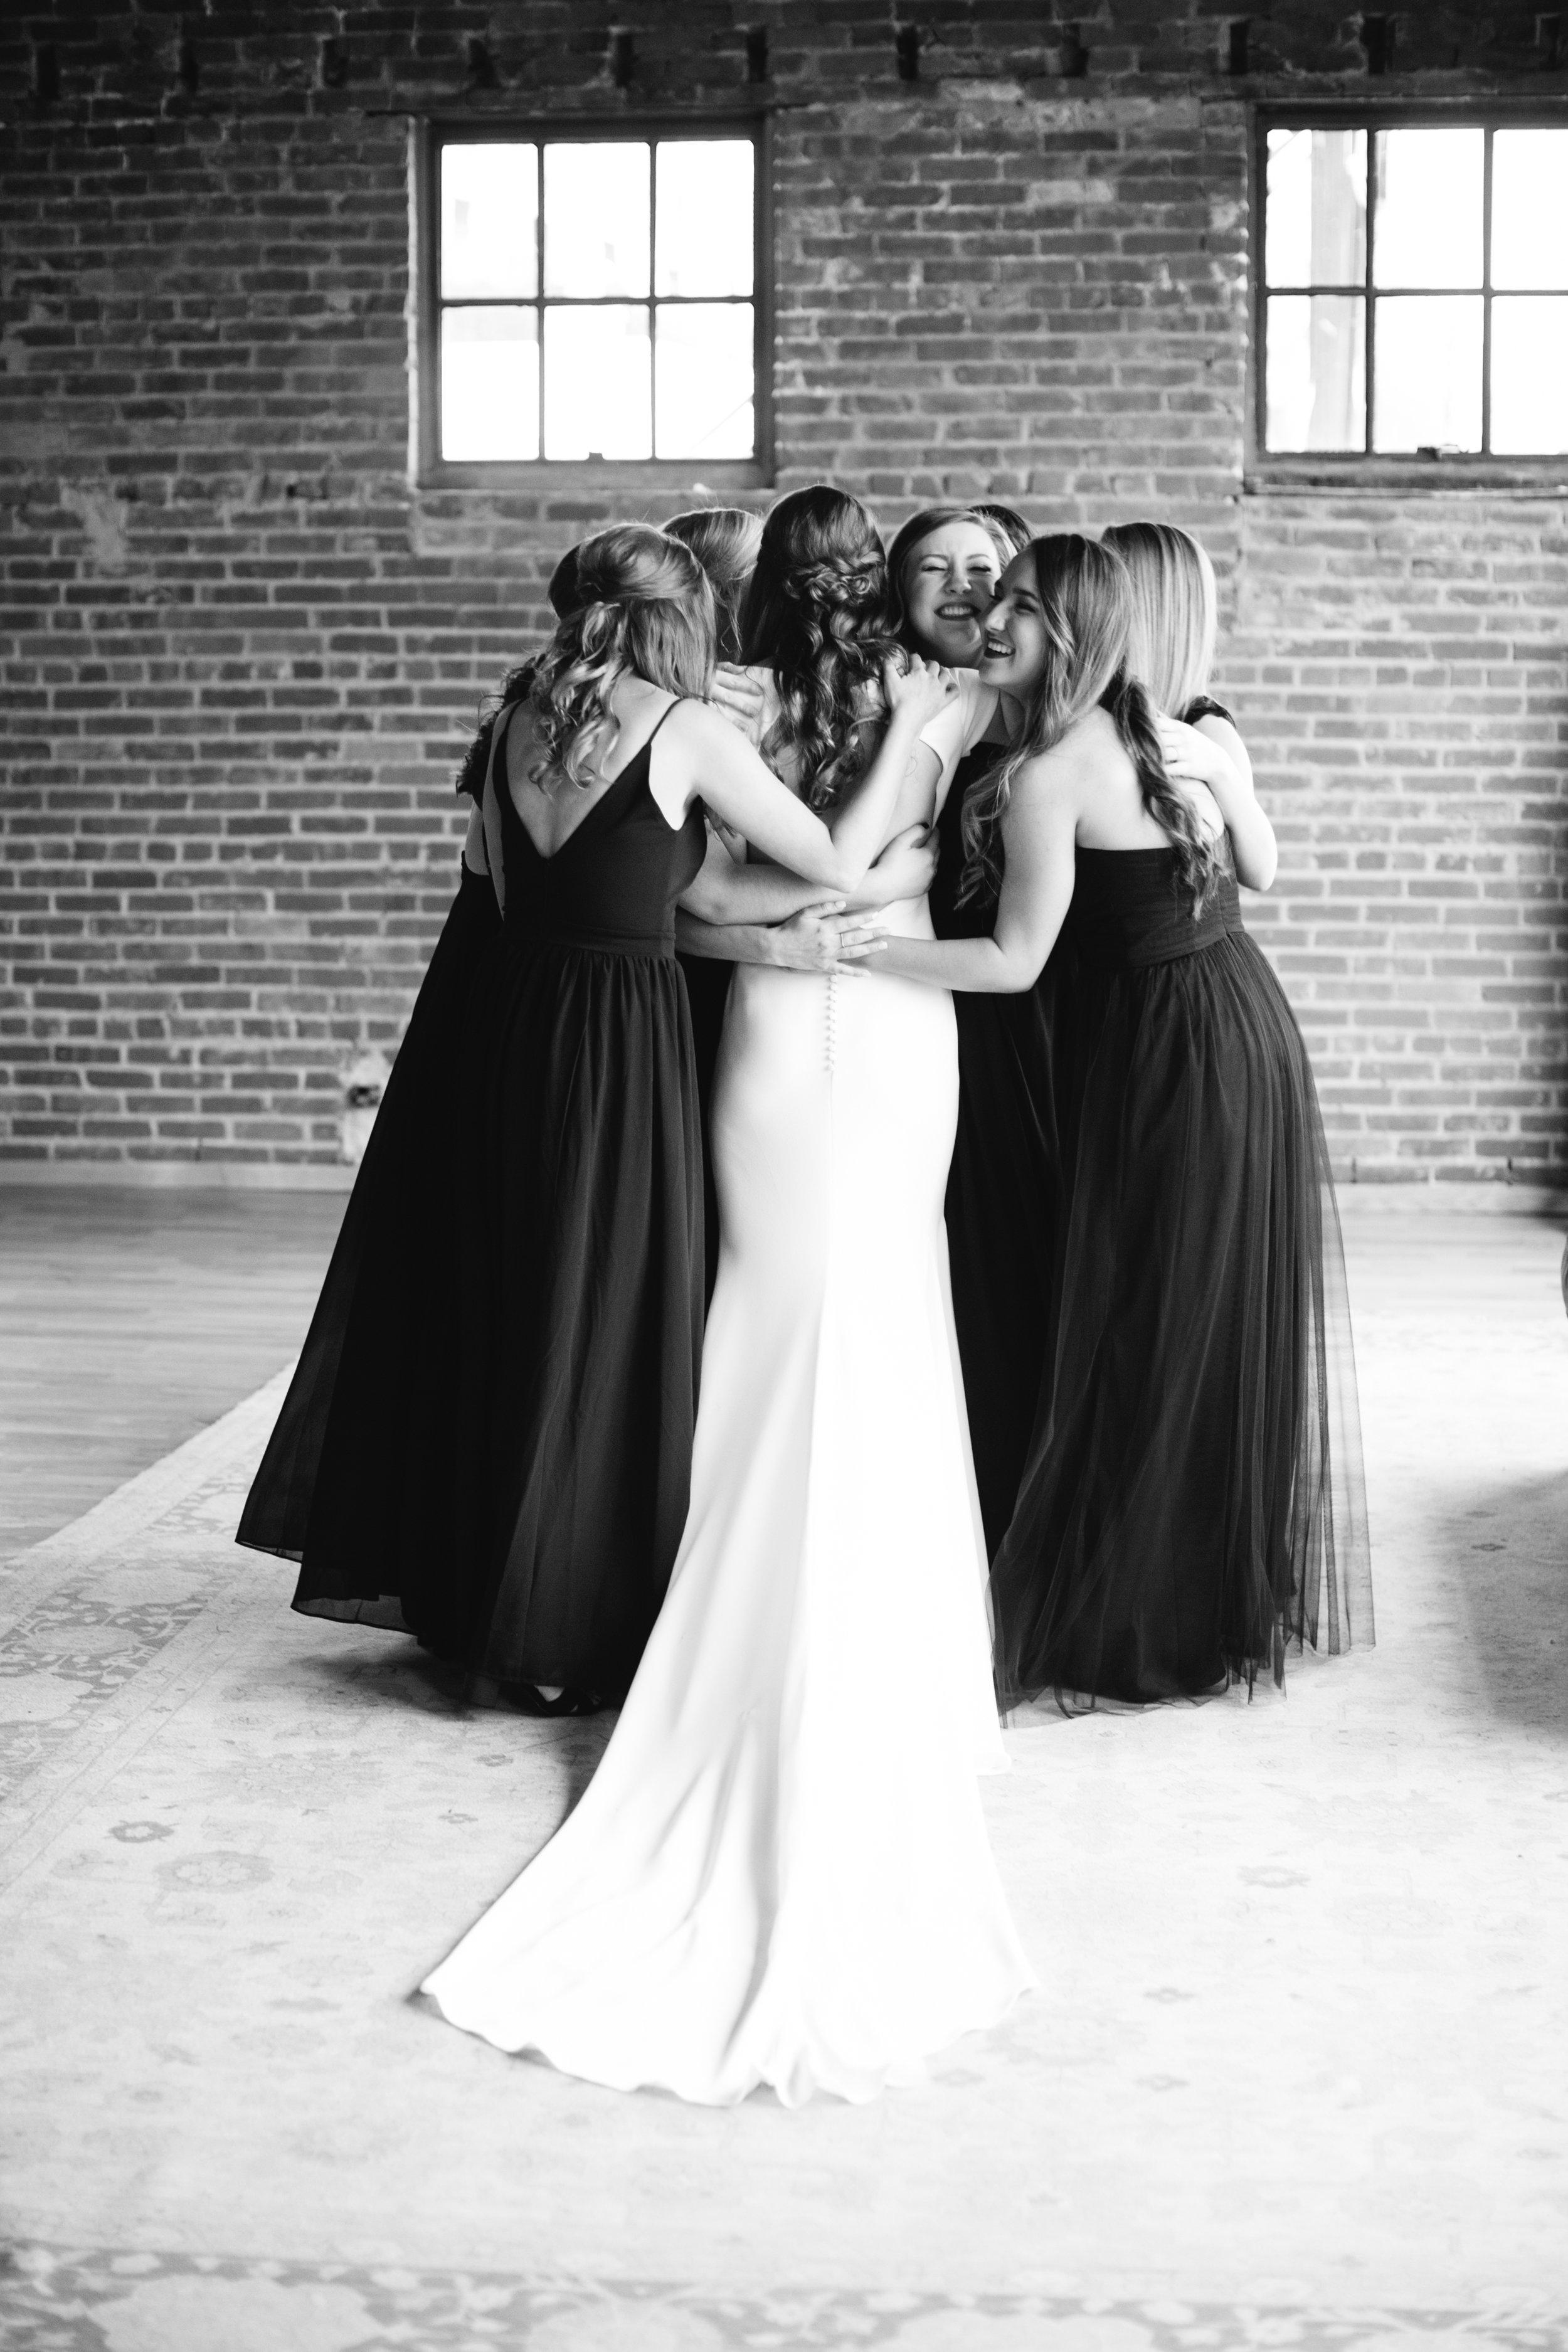 Rache_Brandon_Standard_Wedding_Knoxville_Abigail_Malone_Photography-134.jpg